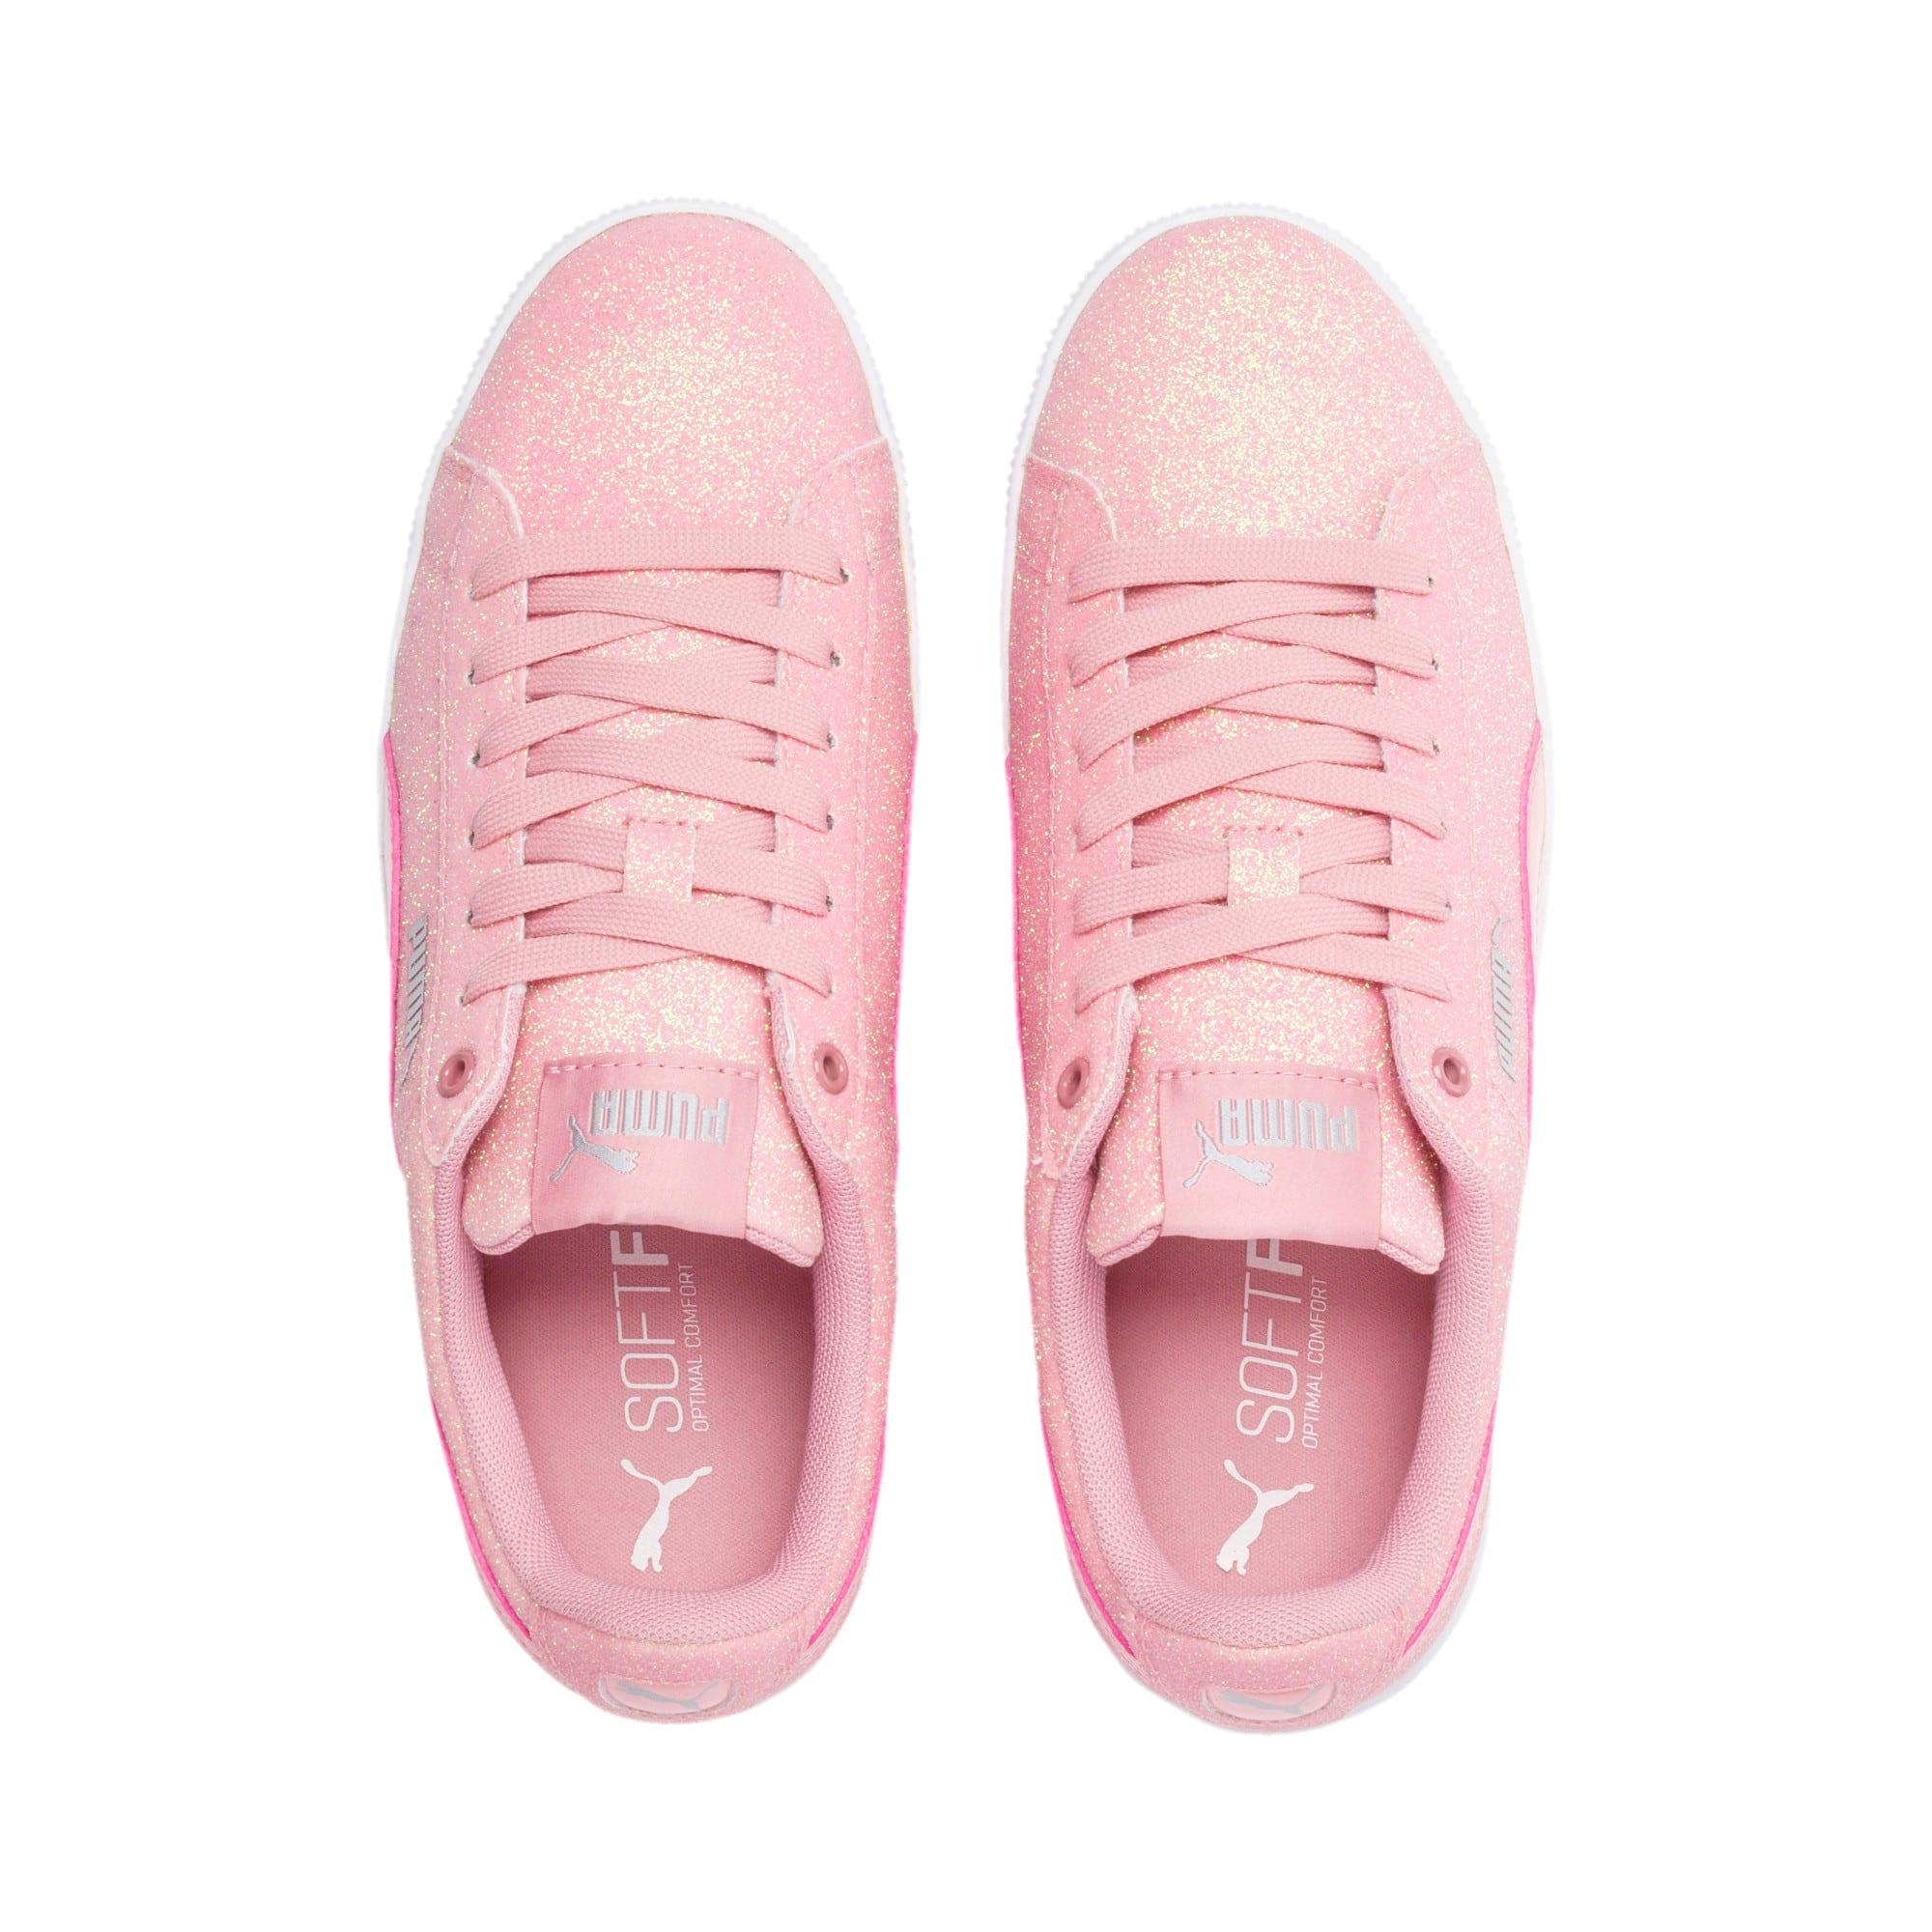 Thumbnail 6 of PUMA Vikky Platform Glitz Sneakers JR, Bridal Rose-Bridal Rose, medium